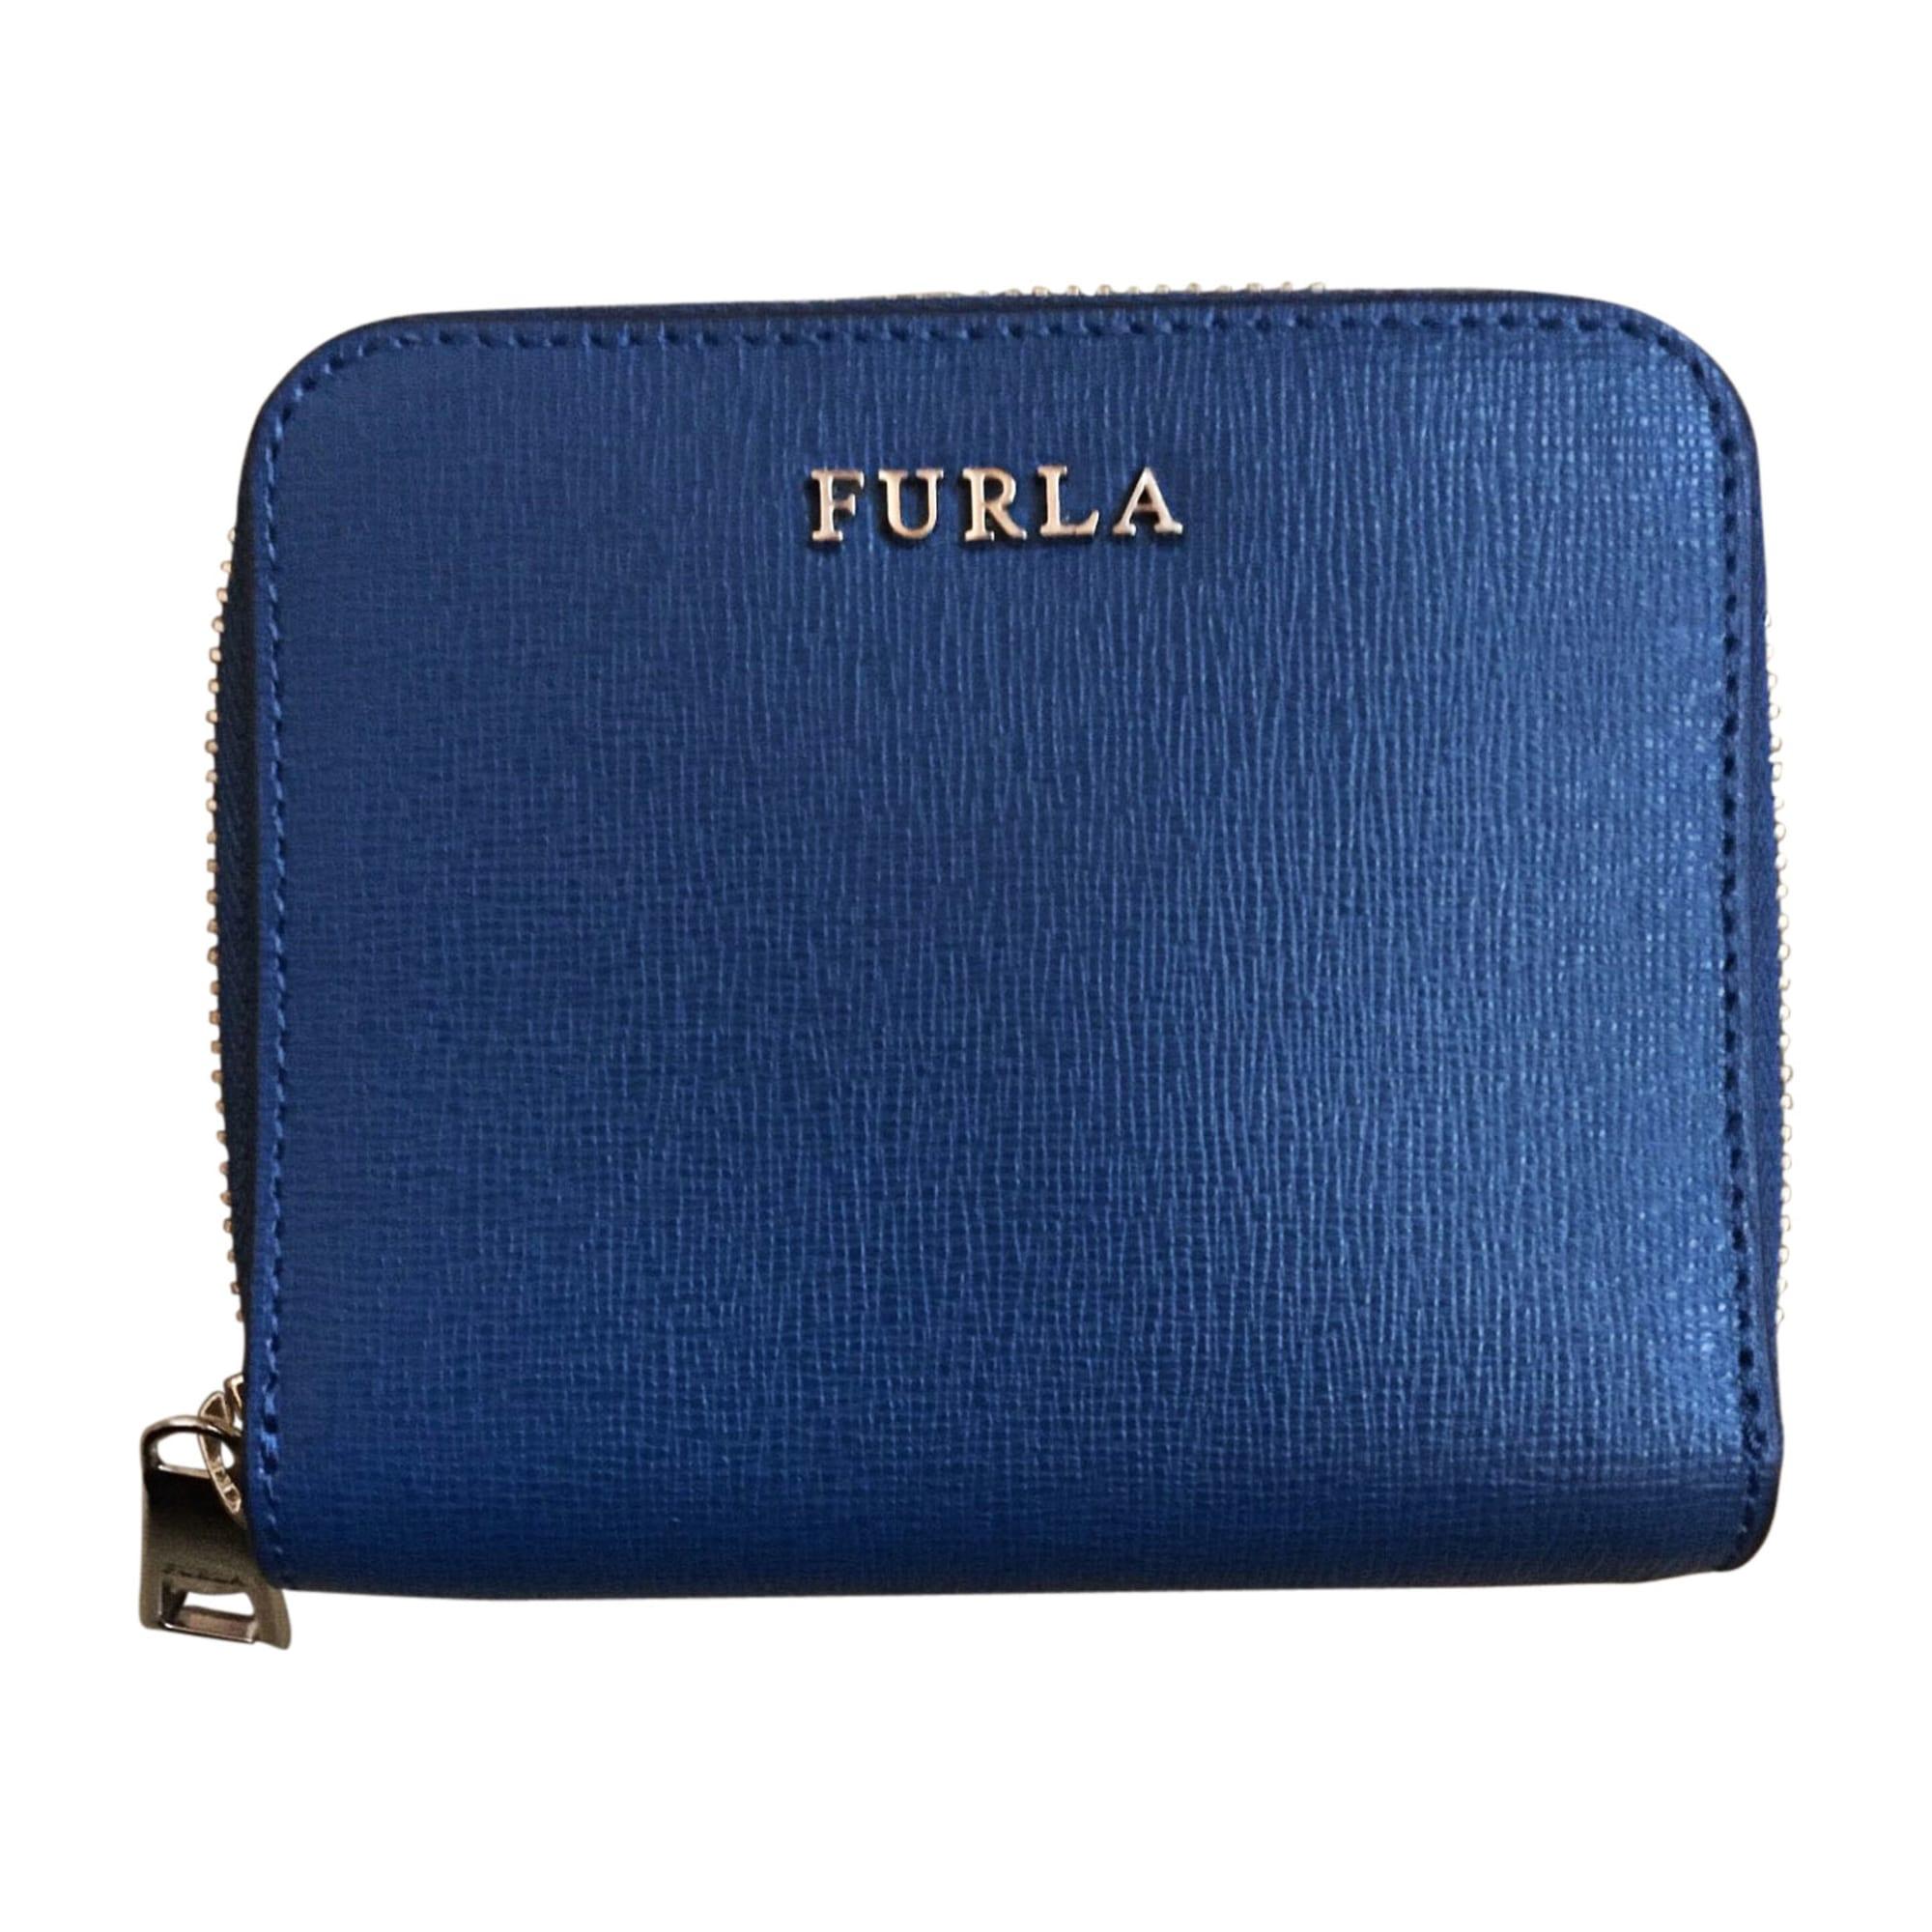 Porte-monnaie FURLA Bleu, bleu marine, bleu turquoise